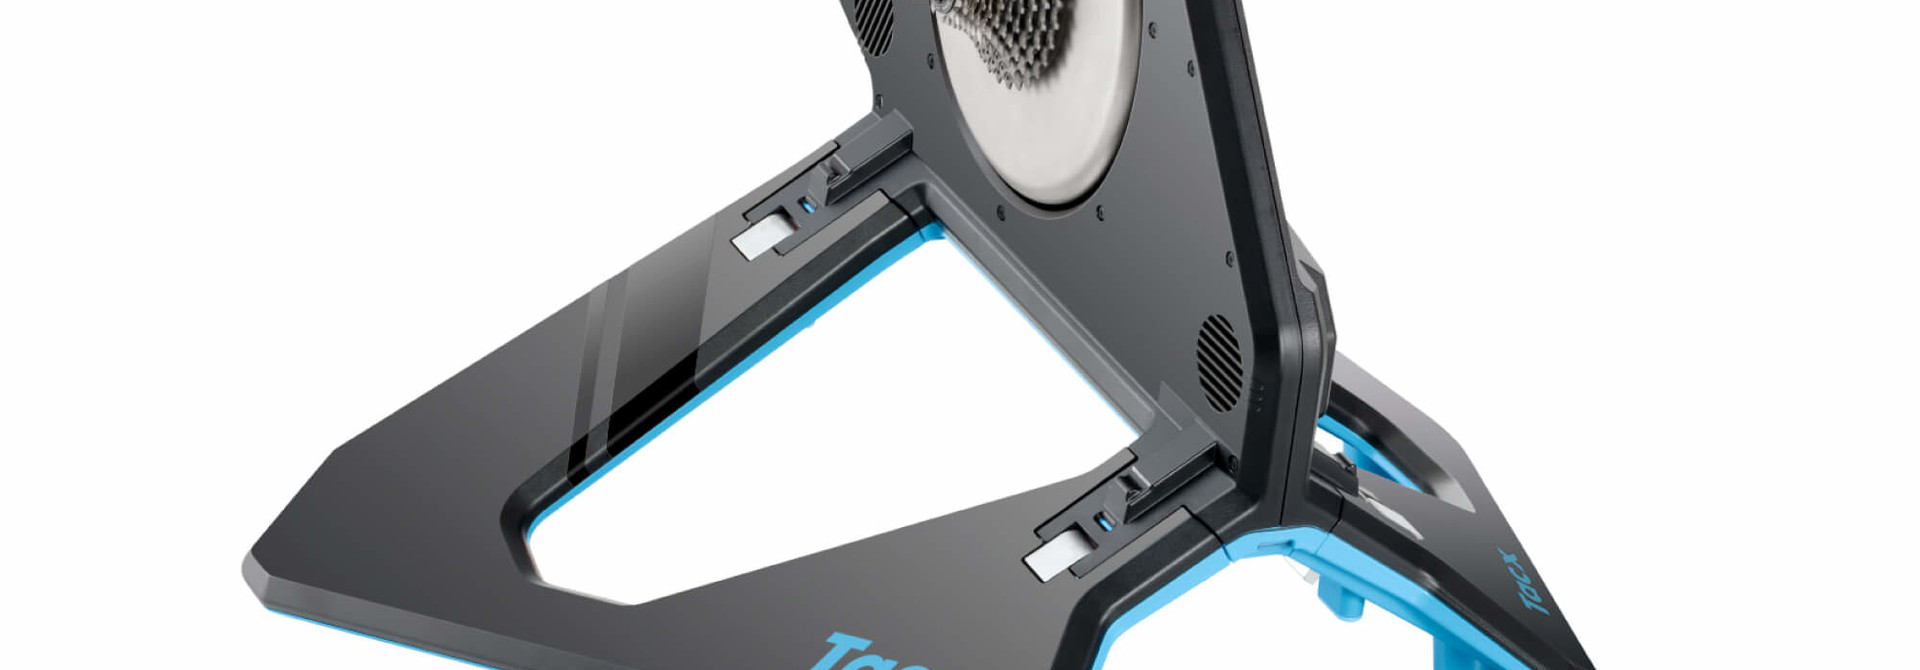 Neo 2T Smart Trainer